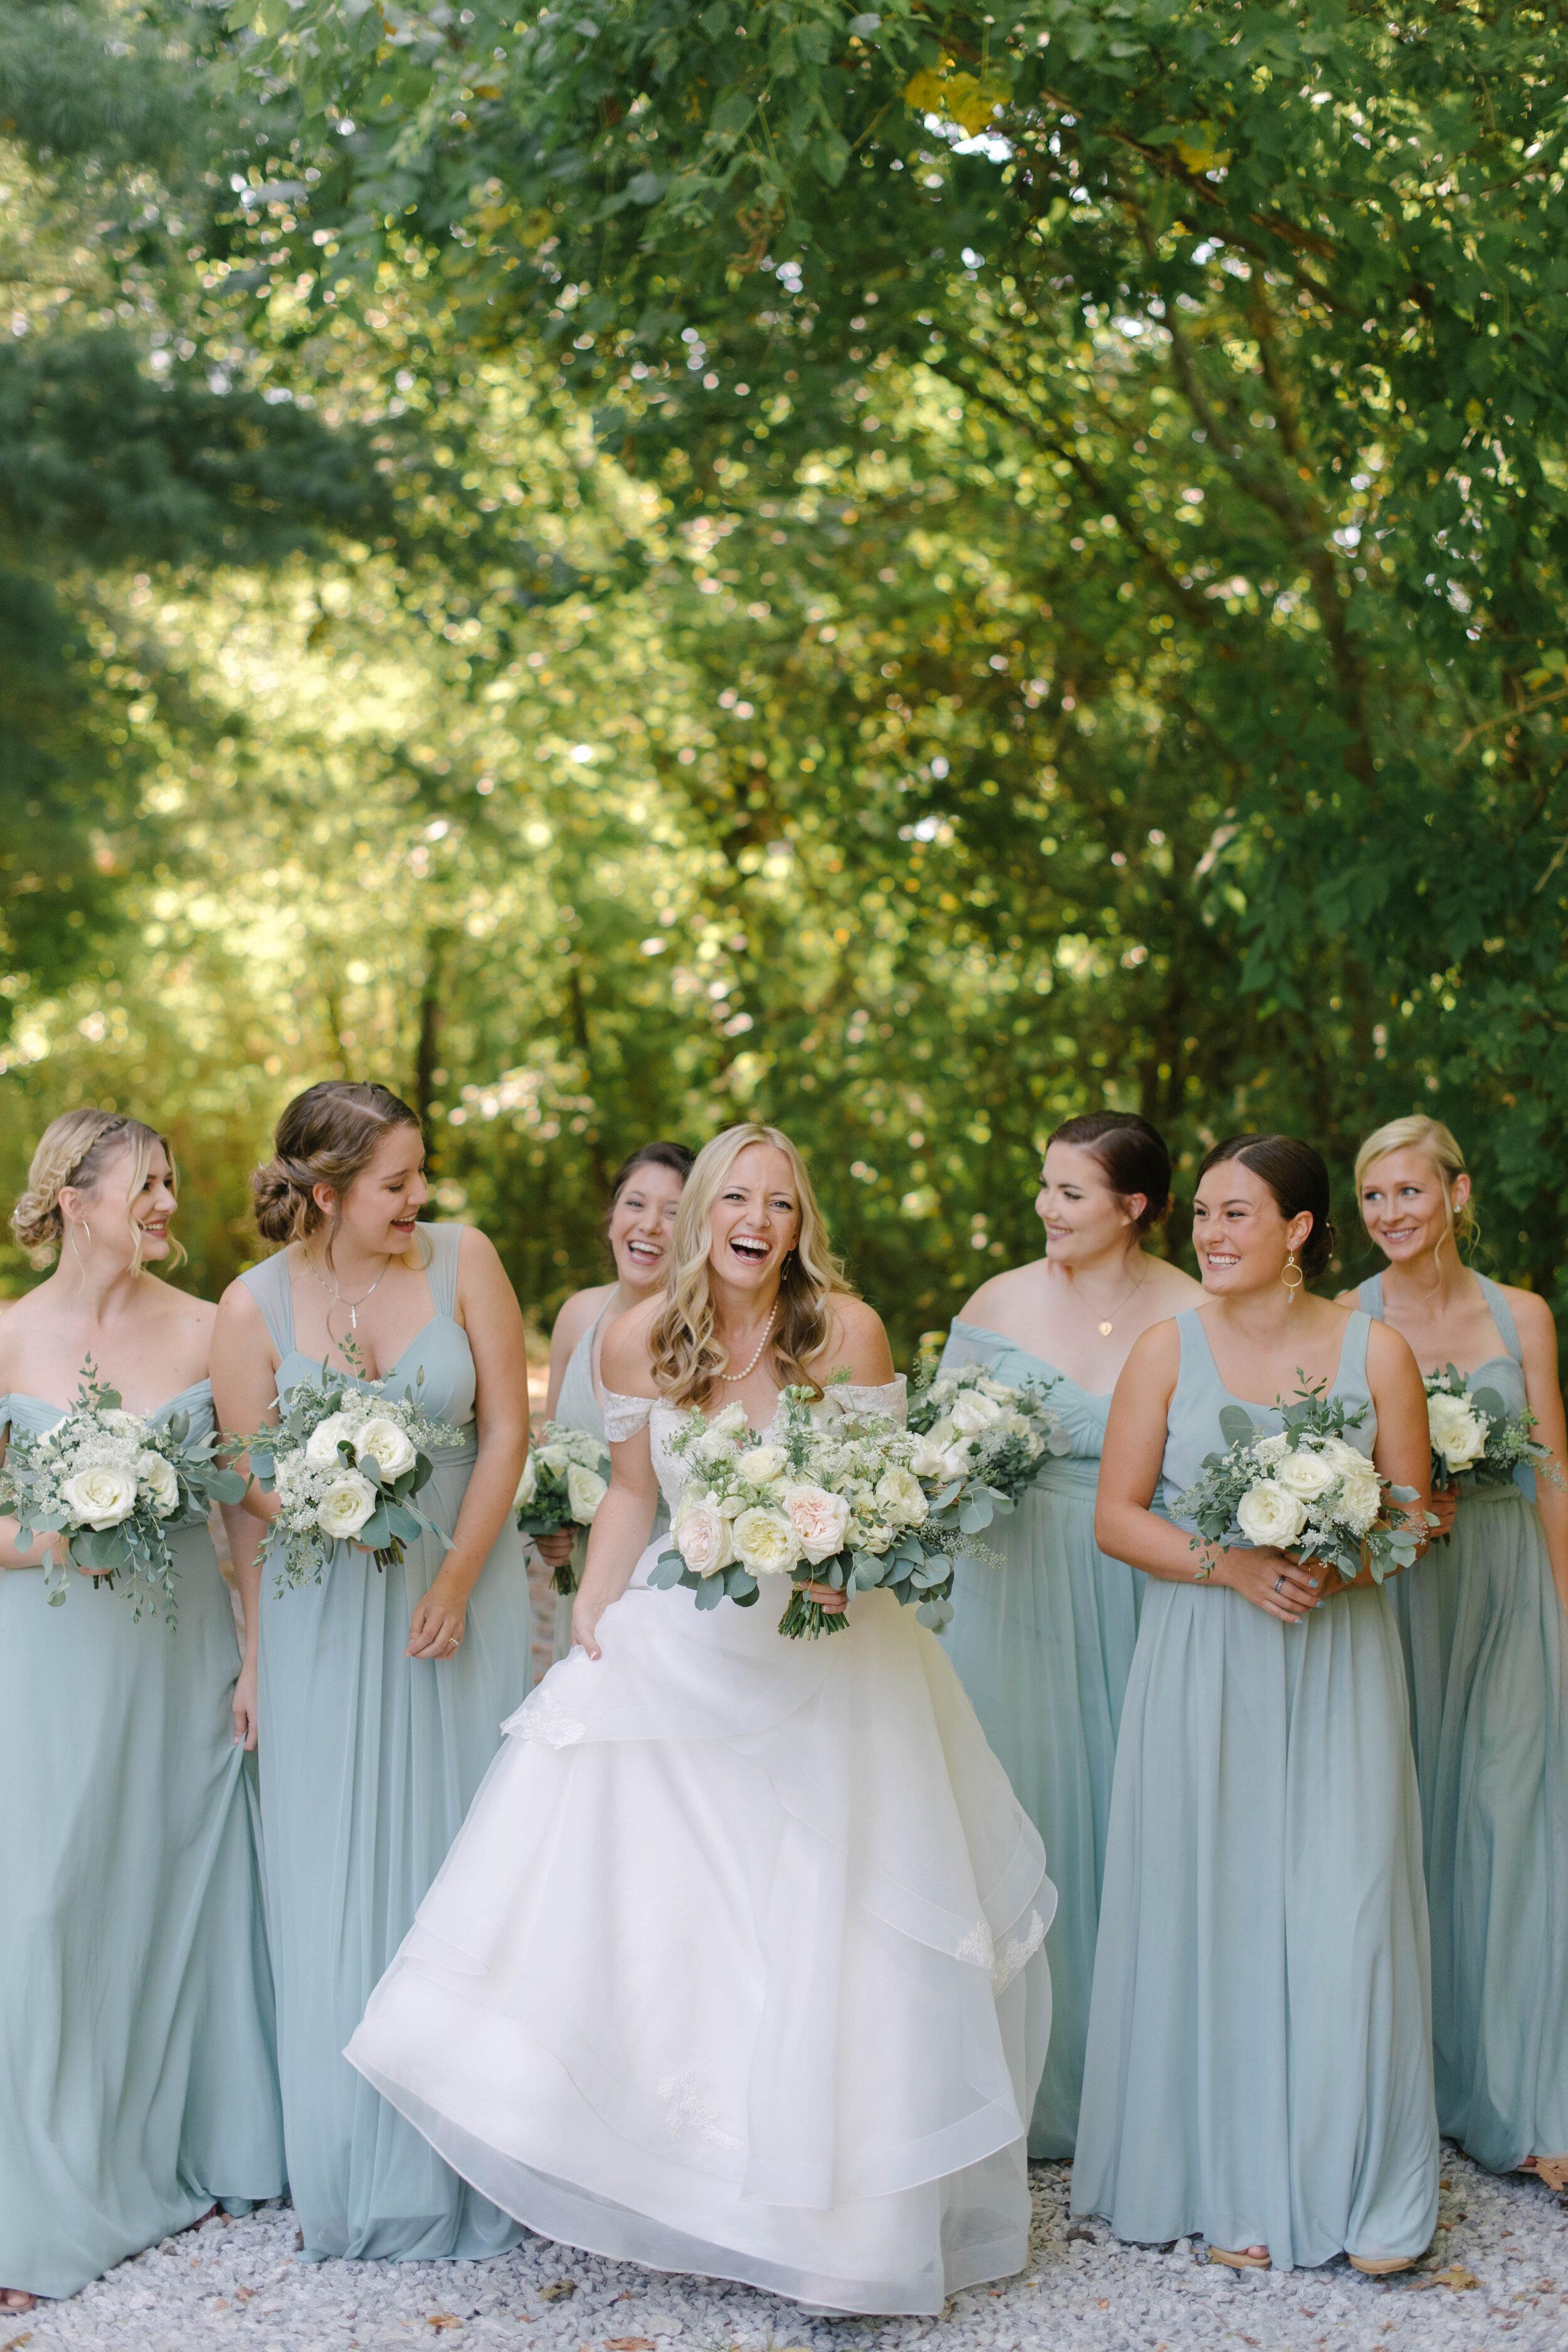 Amy & Aaron Diehl Wedding_September 7 2019_Meadow Hill Farm_Columbia Tennesse_Jessica Sheppard_Nashville Photographer-459.jpg